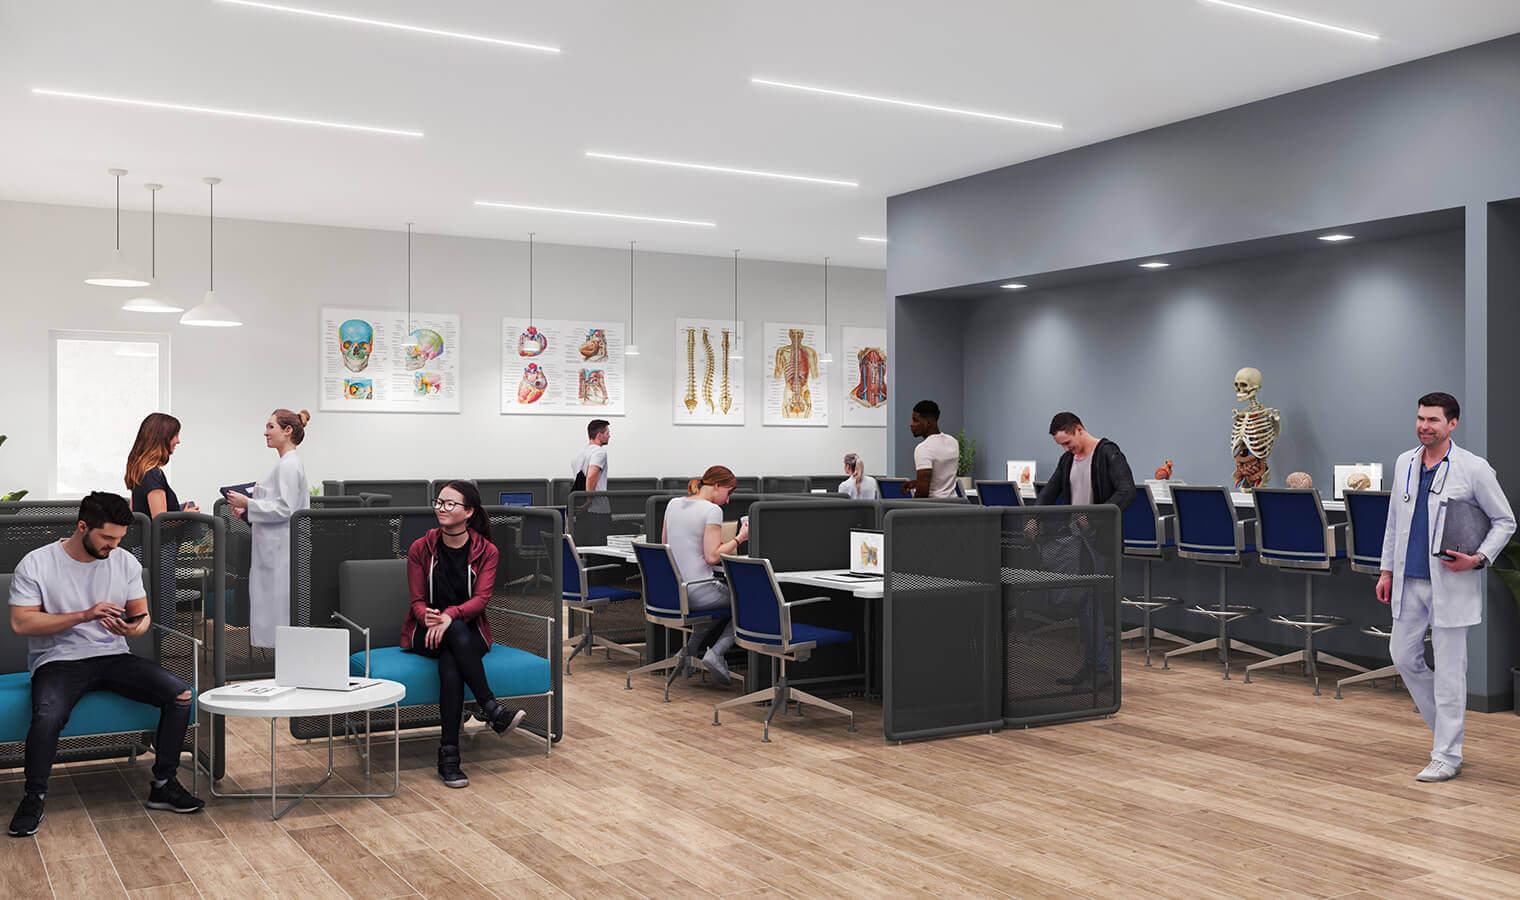 student study center